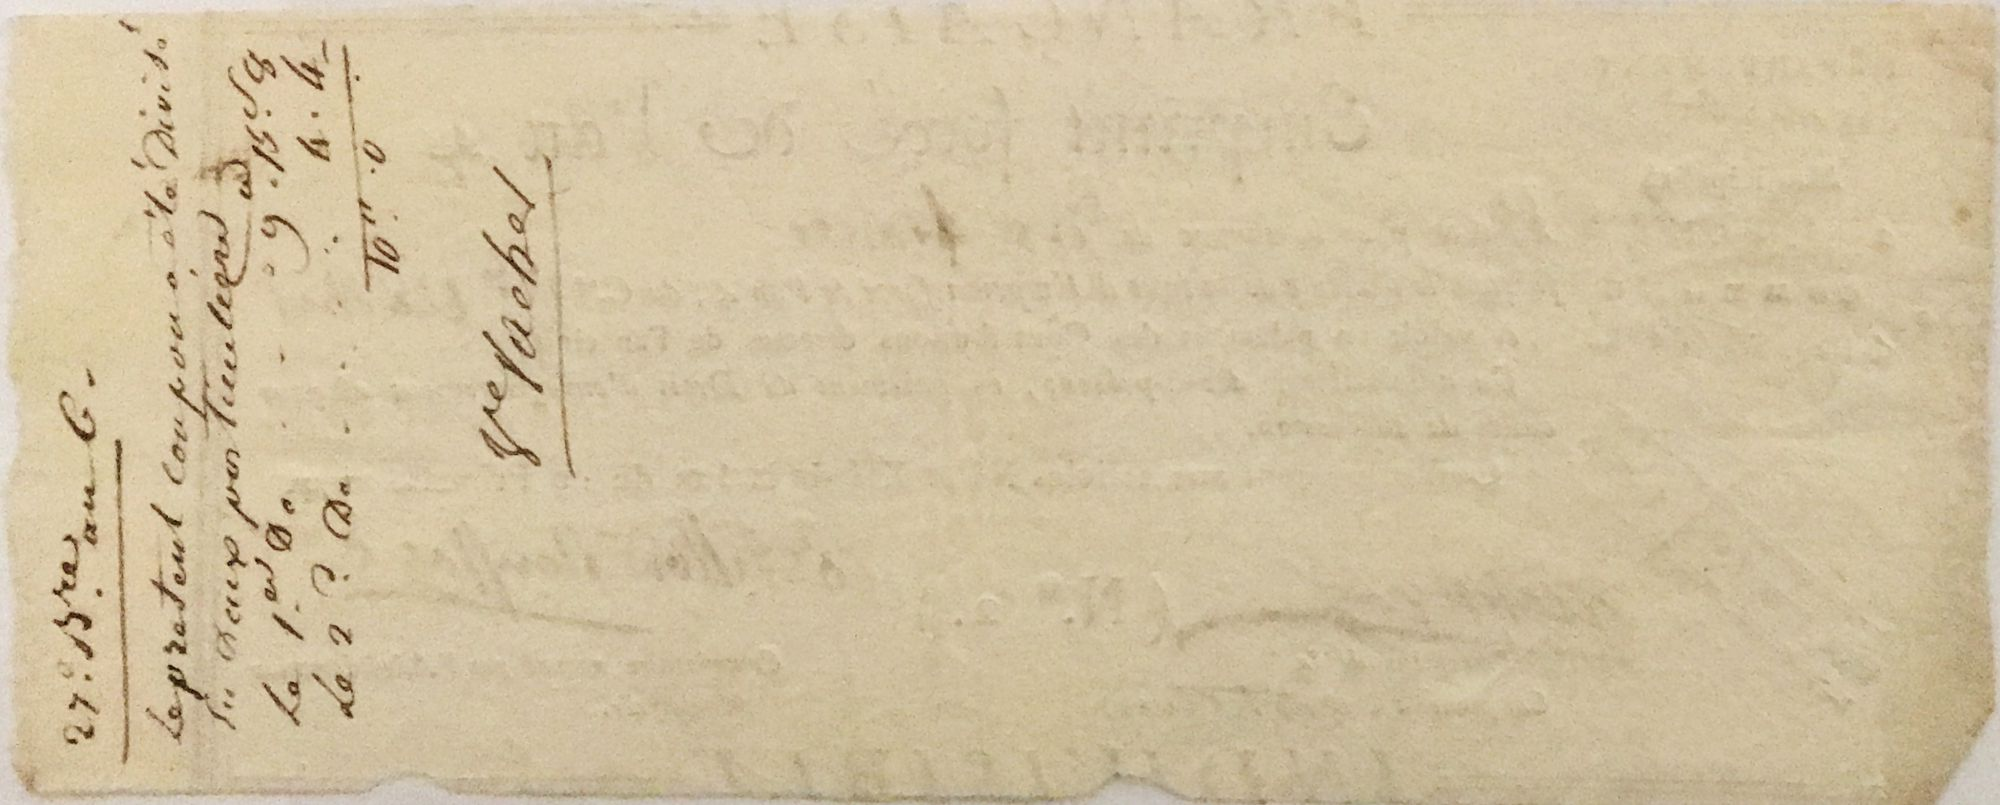 France 10 Francs Emprunt Forcé - An 4 (1796) - Gard - Saint-Ambroix - Castillon - TTB+